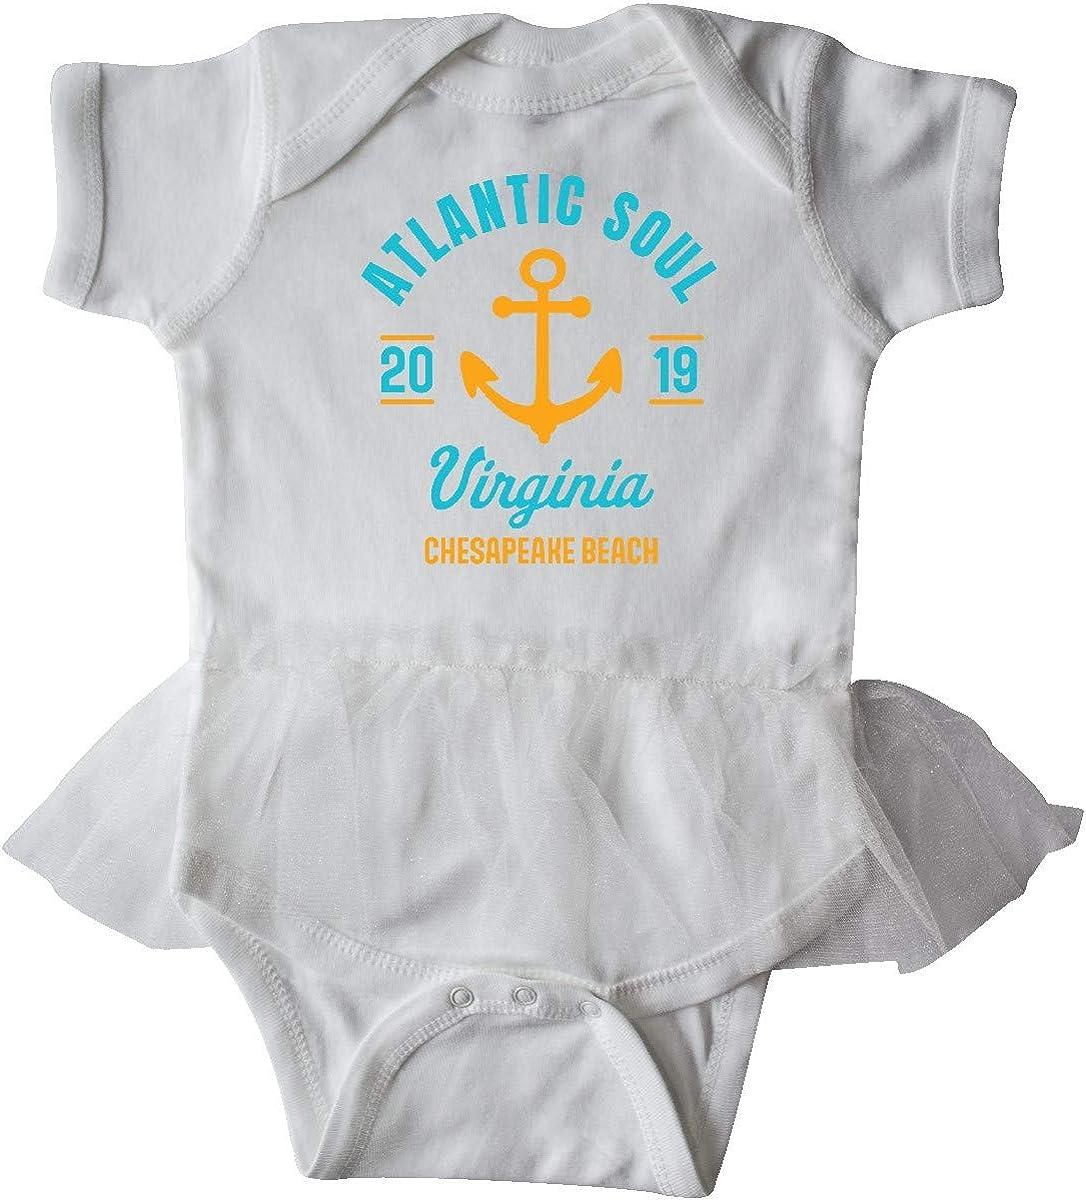 inktastic Atlantic Soul Virginia Chesapeake Beach 2019 with Infant Tutu Bodysuit